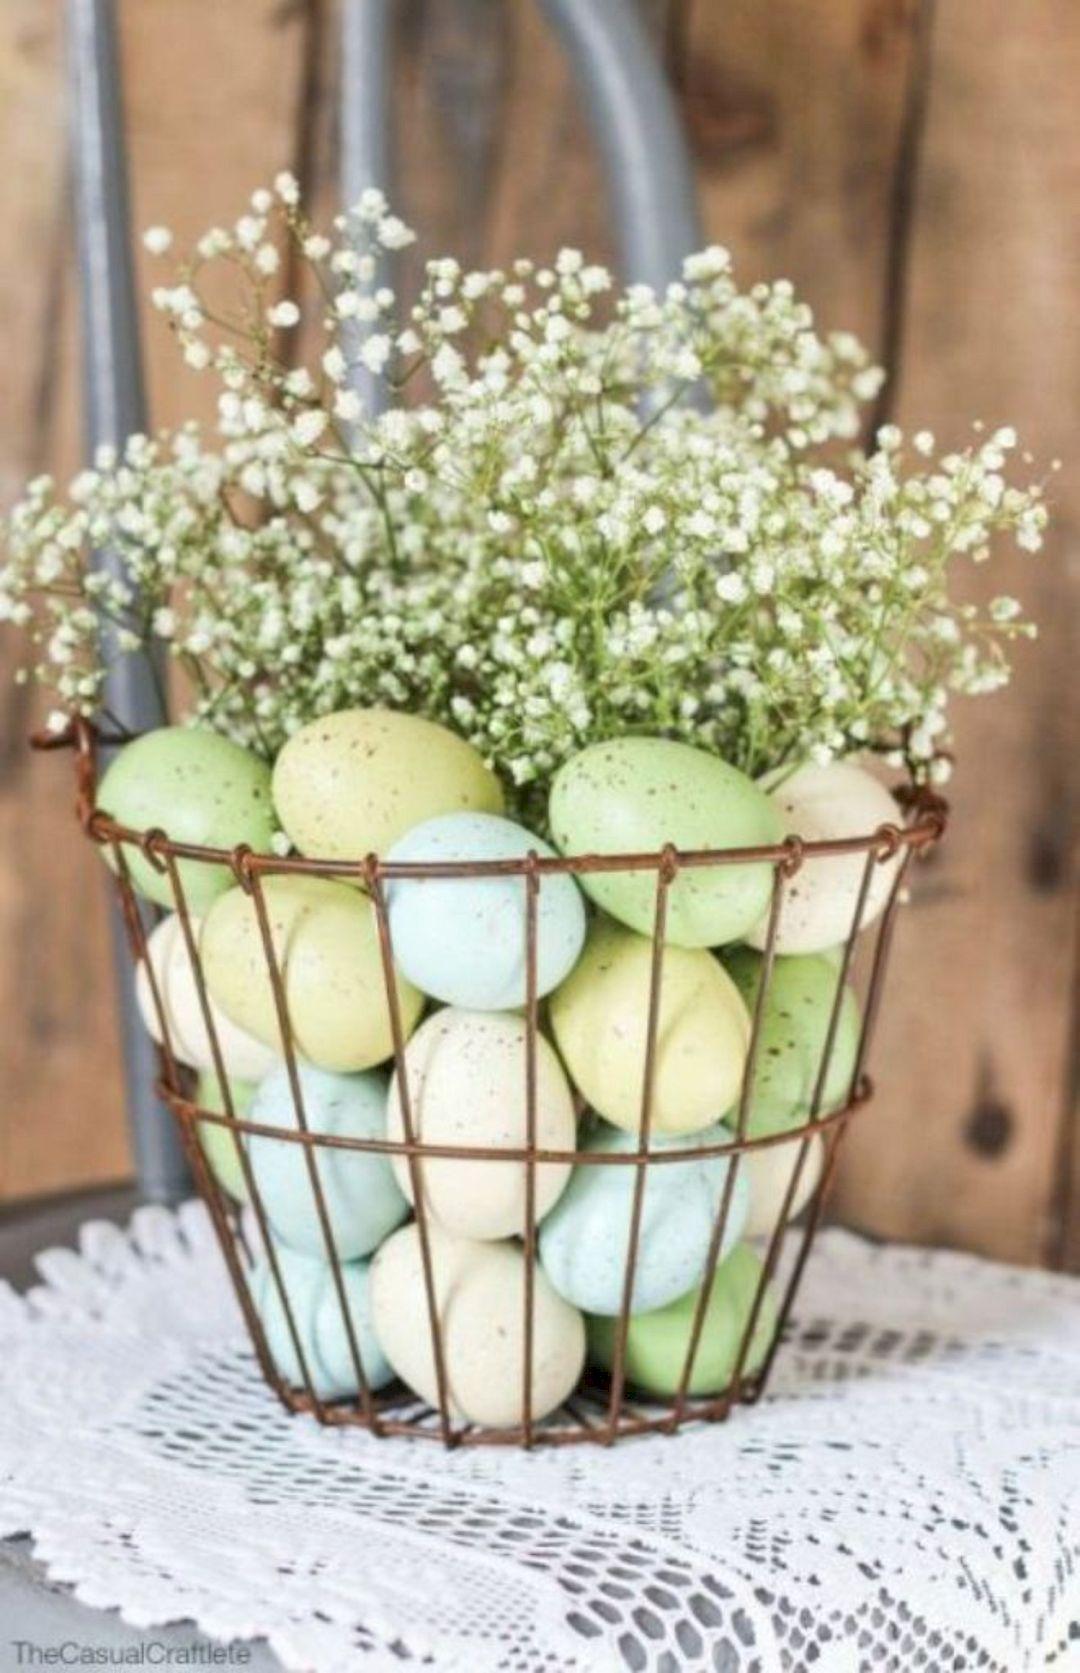 18 wonderful easter decorating ideas - Easter Decorating Ideas